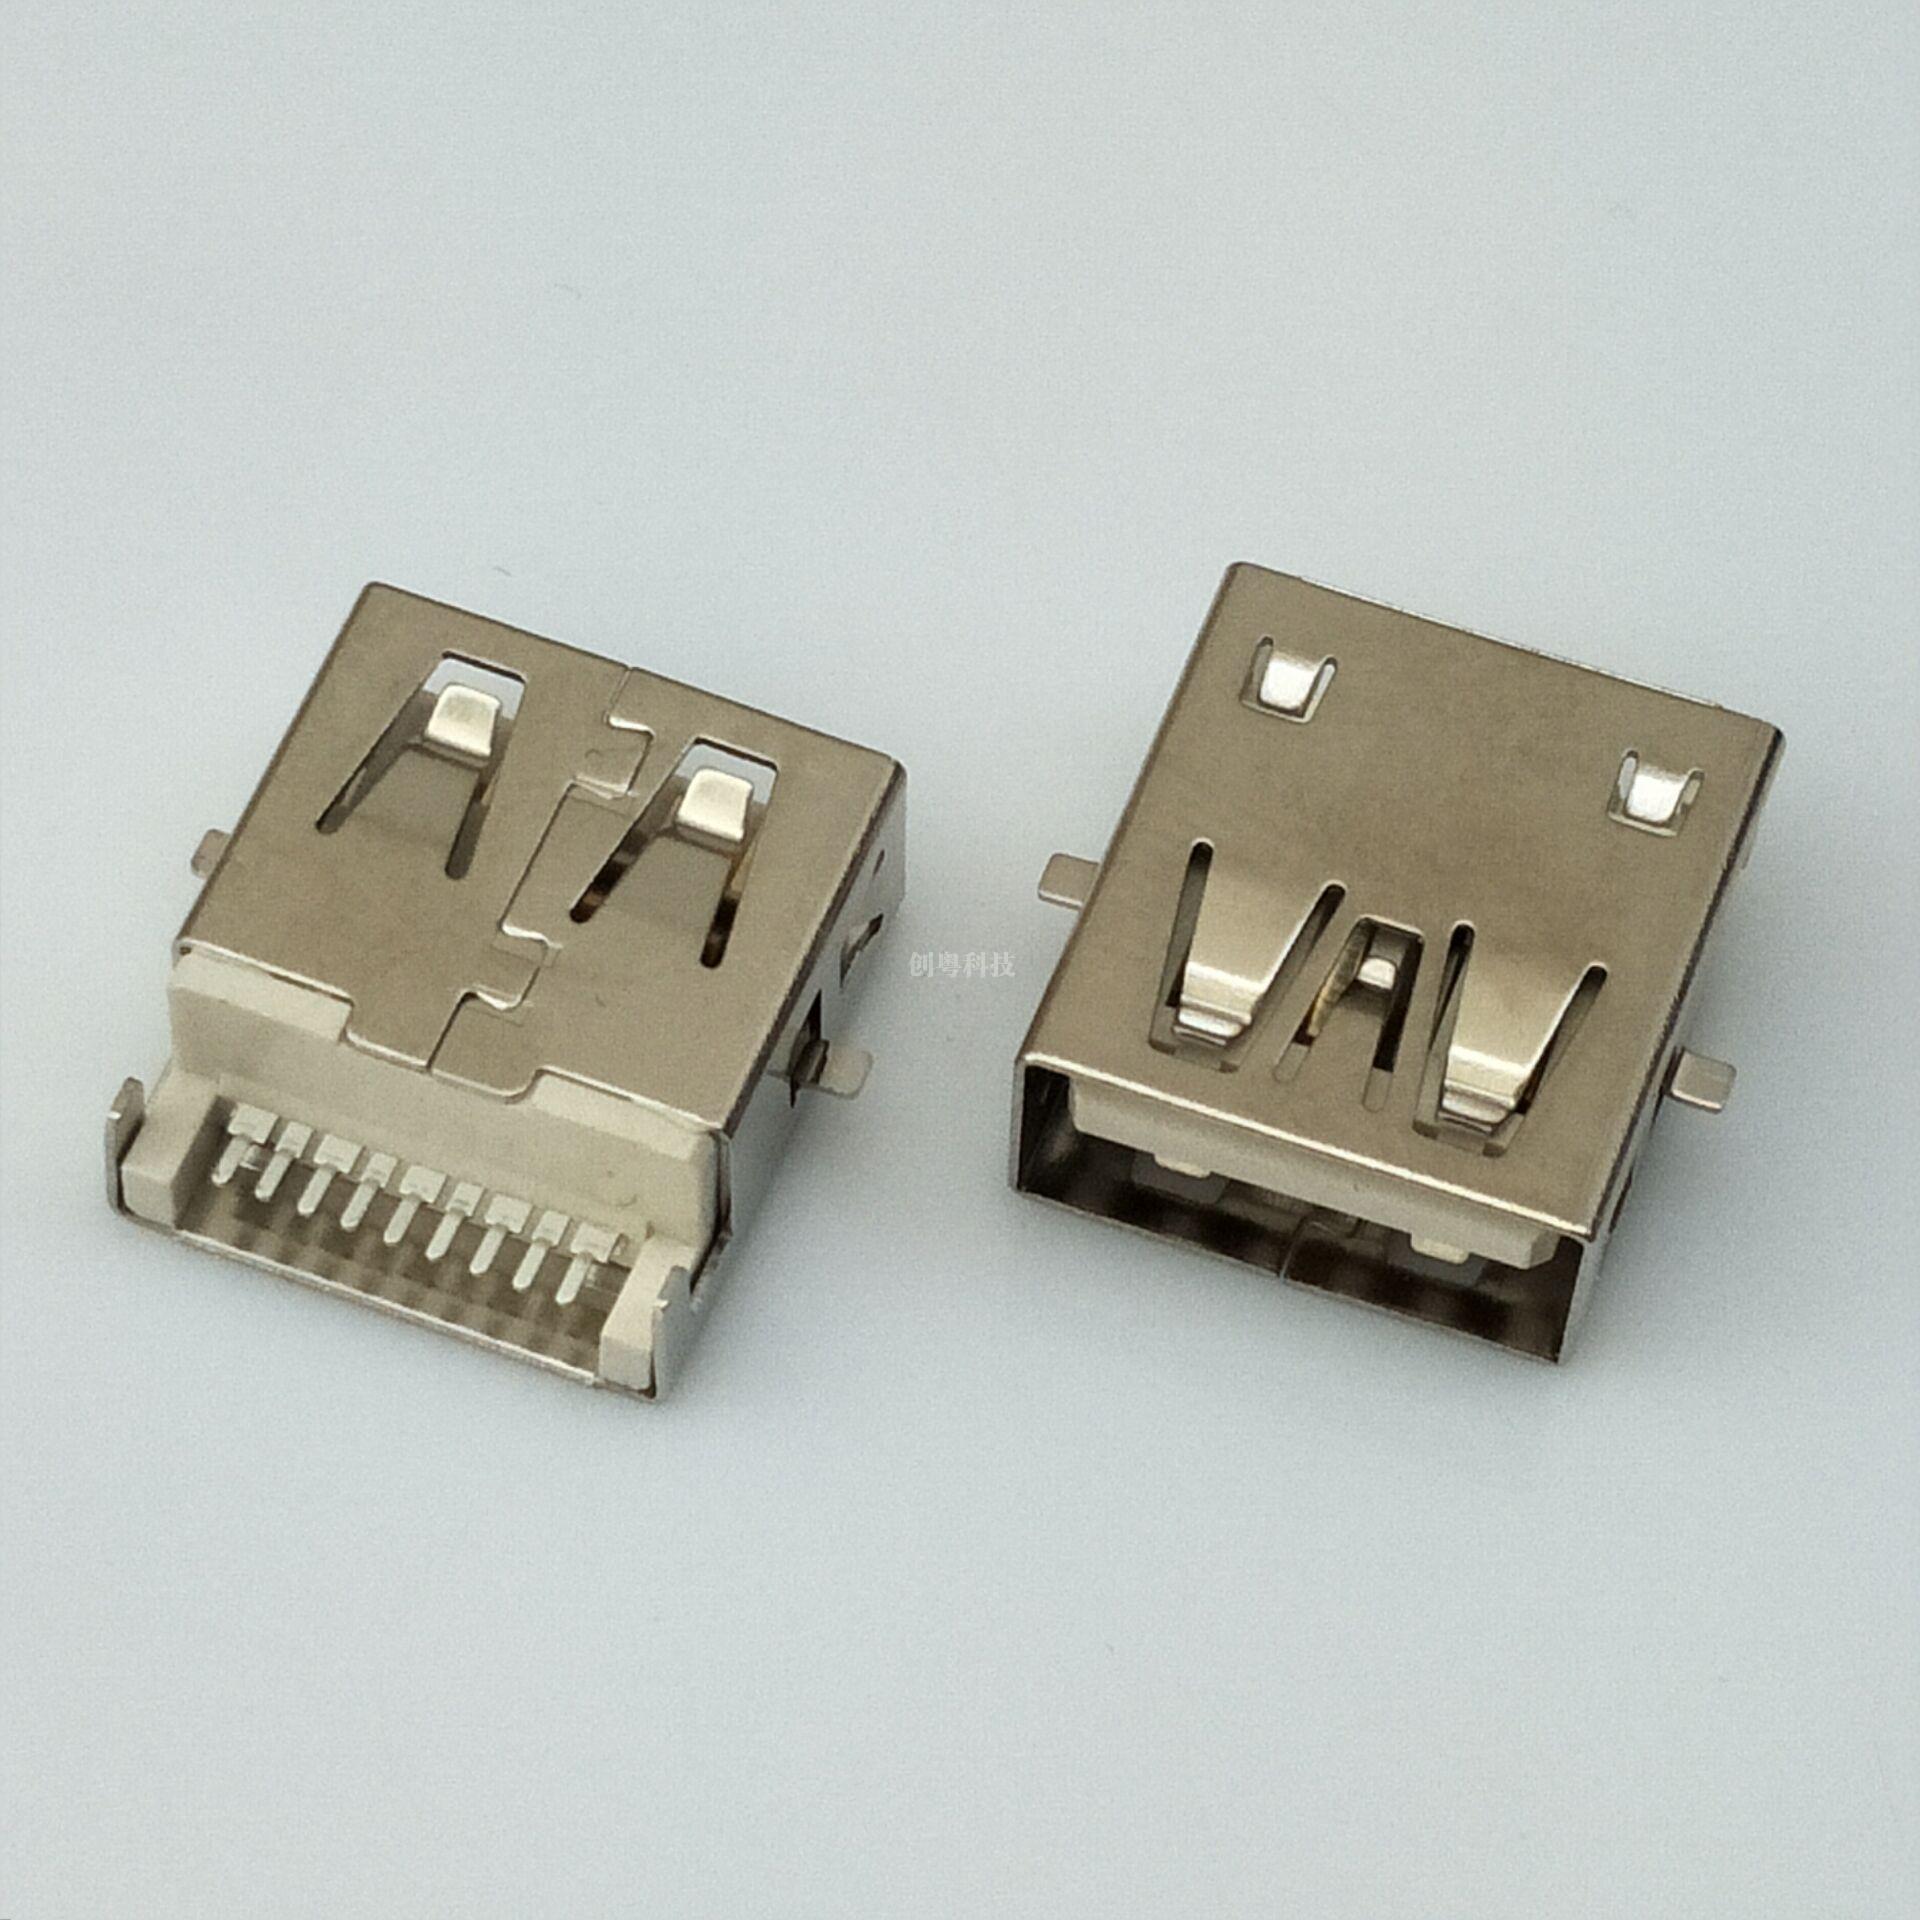 USB 3.0 沉板SMT